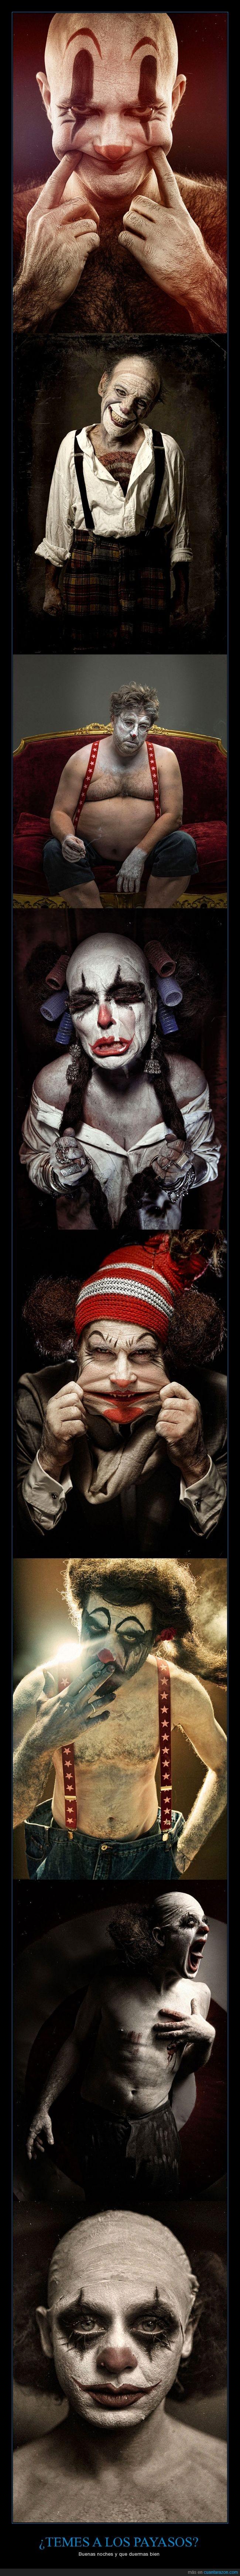 circo,coulrofobia,fobia,maquillaje,miedo,payaso,terror